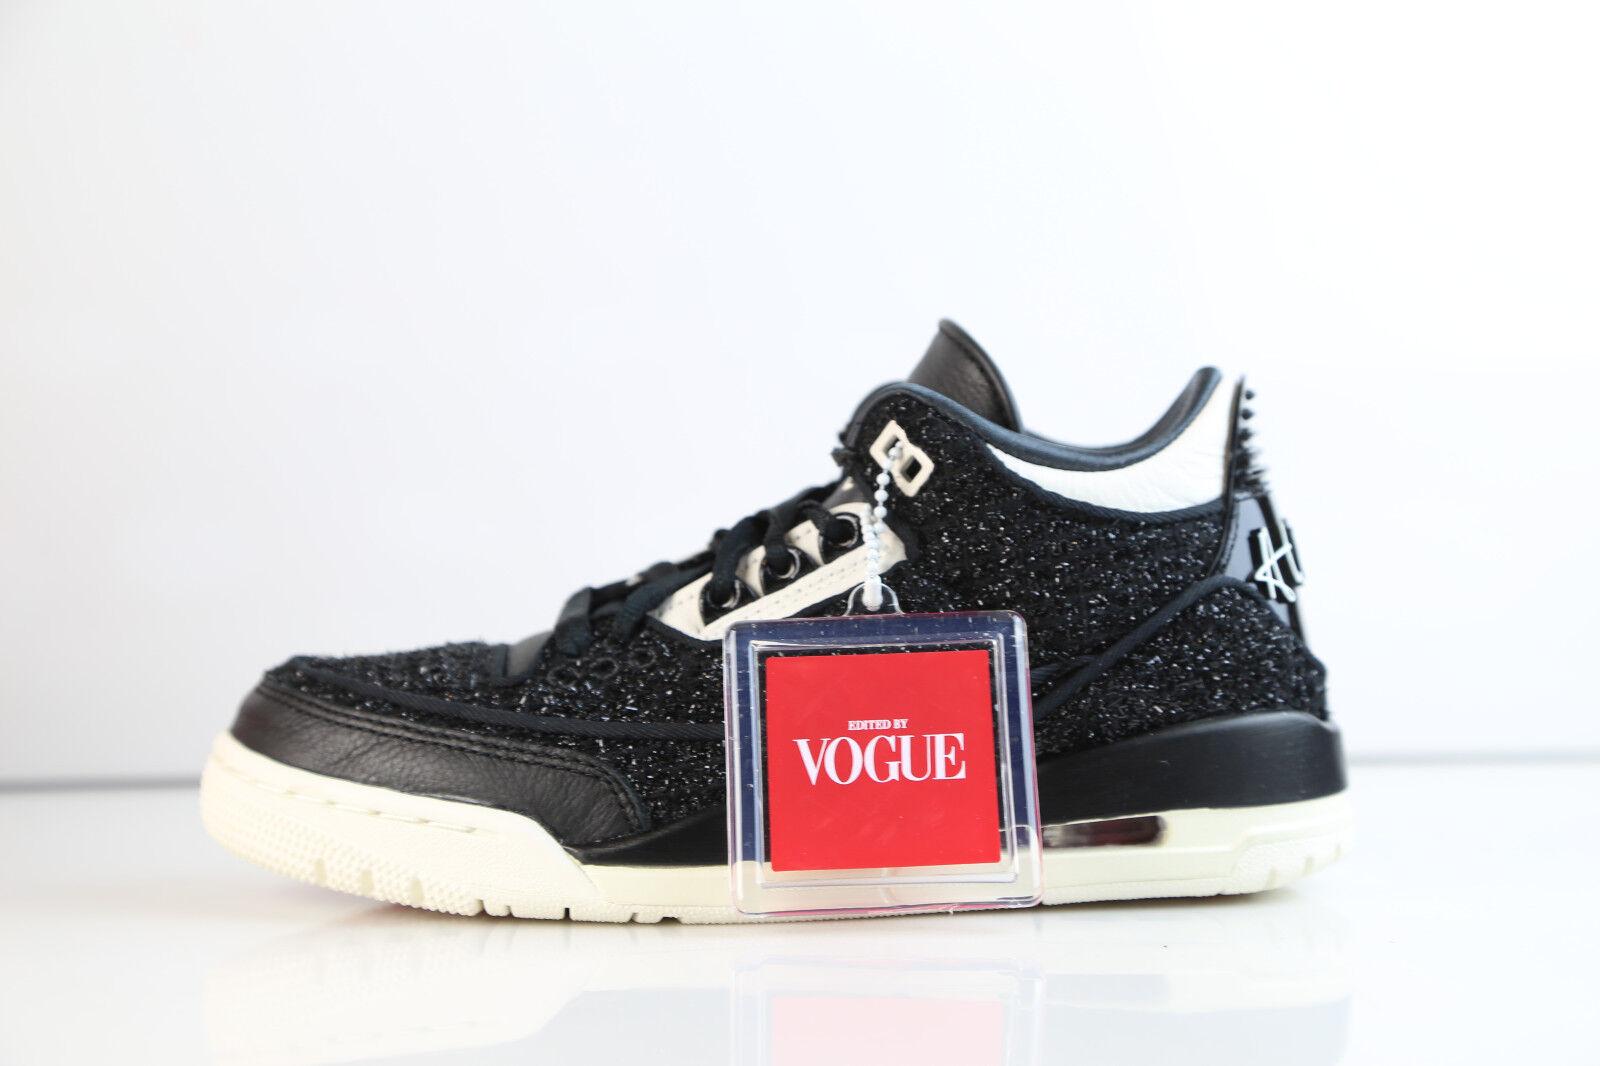 Para mujer Air Jordan Retro 3 RTR RTR RTR se NRG Vogue awok Negro Blanco BQ3195-001 5-12 1 8d786a